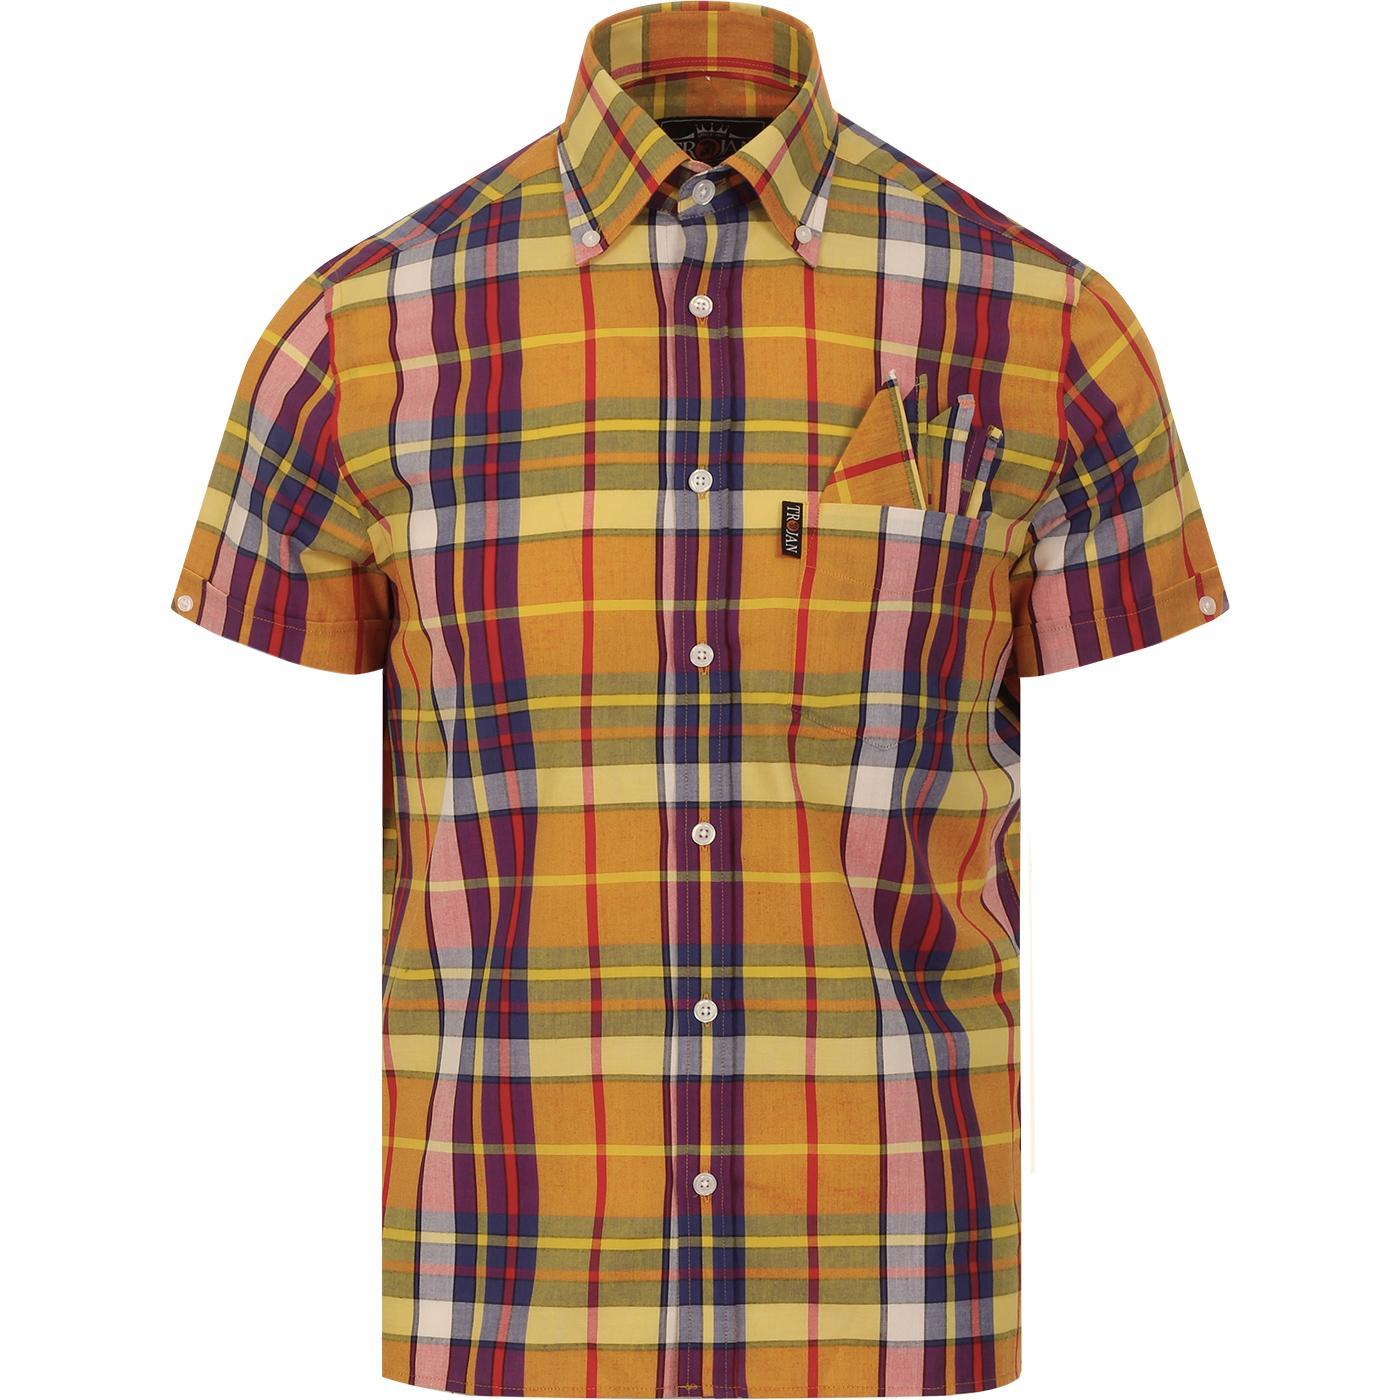 TROJAN RECORDS Mod Ska Madras Check Shirt (Gold)